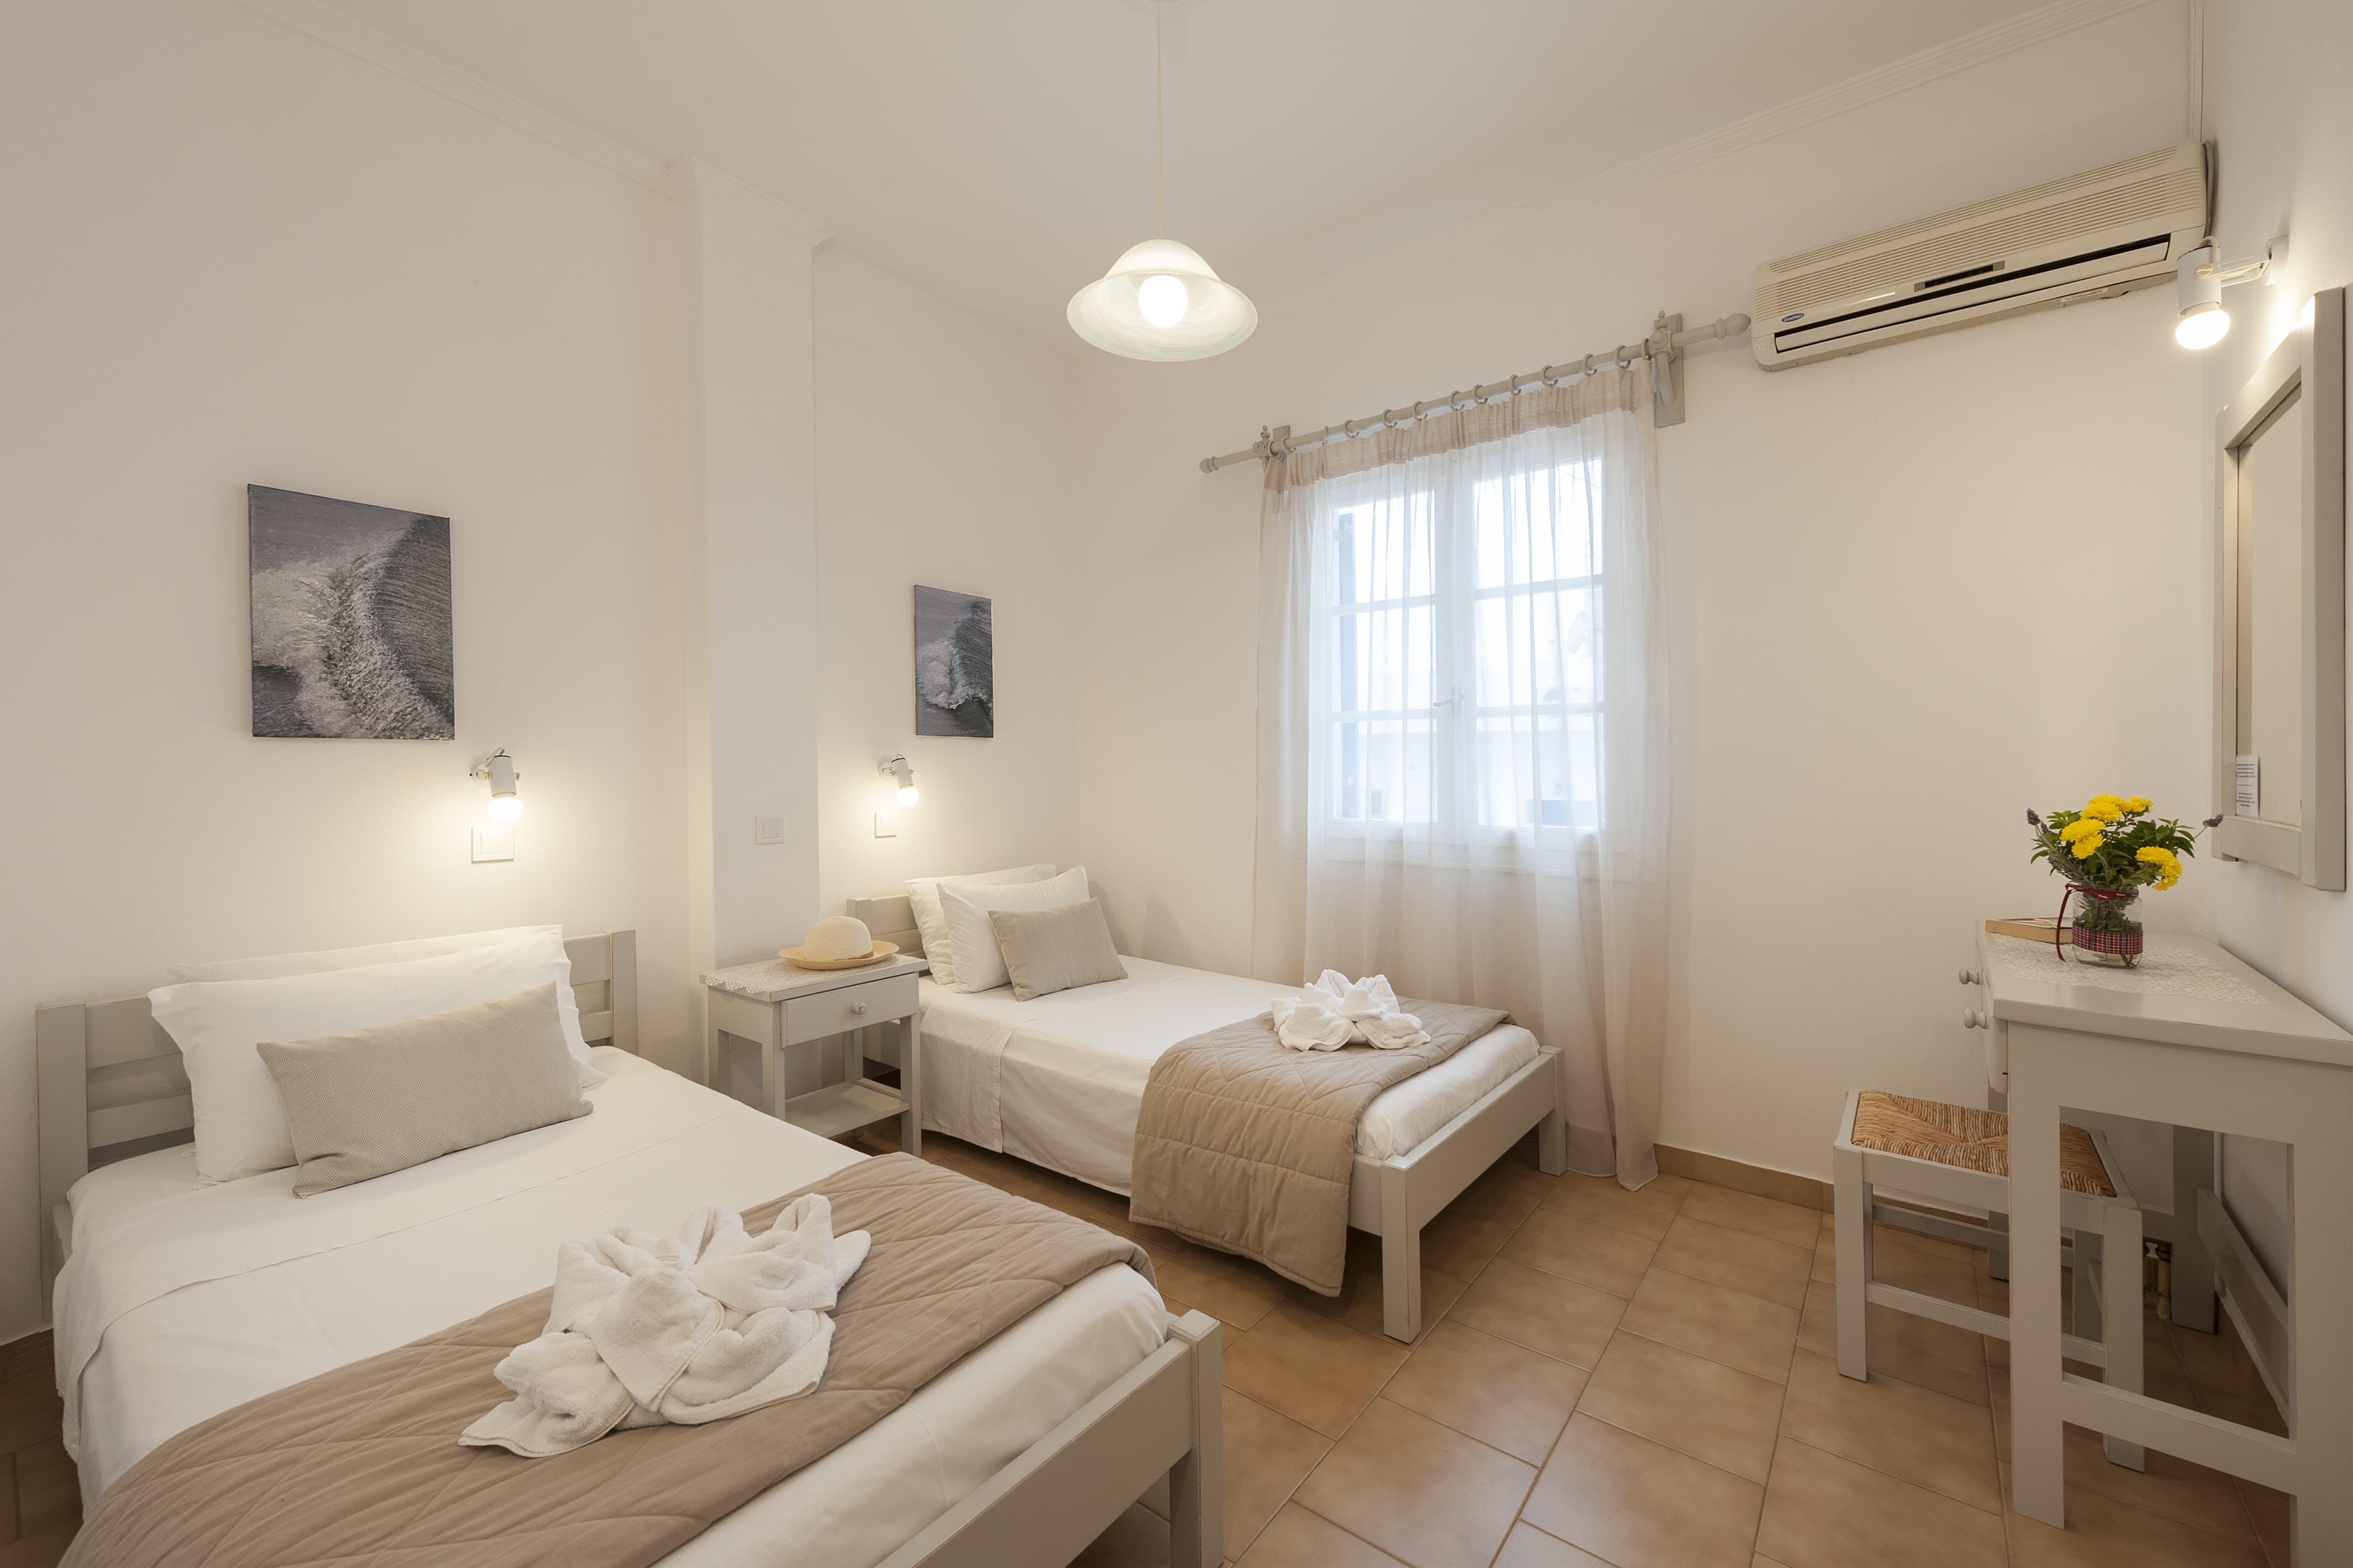 Two Bedroom with terrace bedroom 2